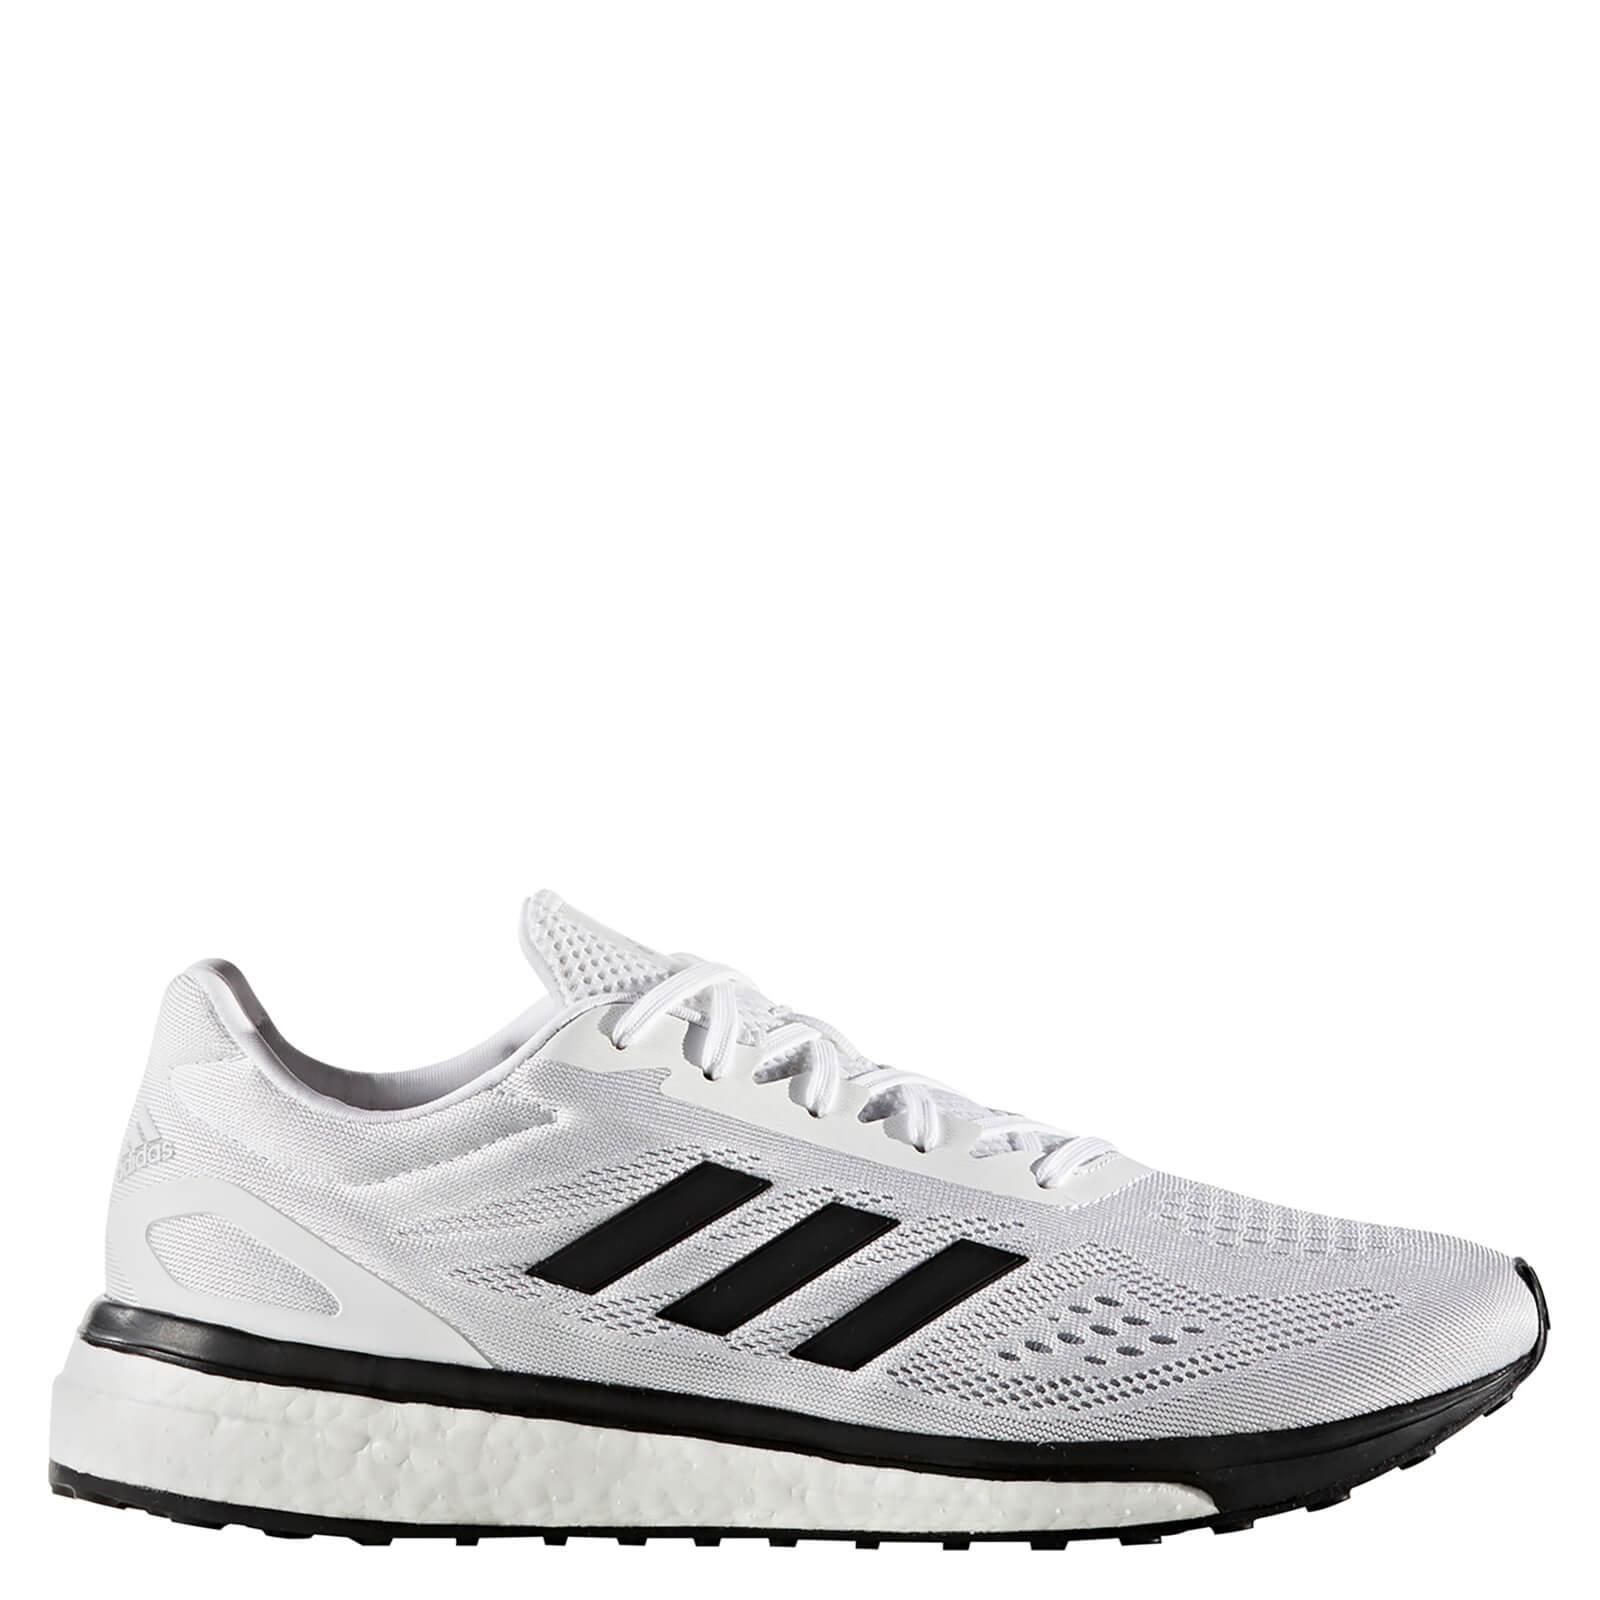 f3c3a6d0f6dc adidas Men s Response LT Running Shoes - White Core Black ...